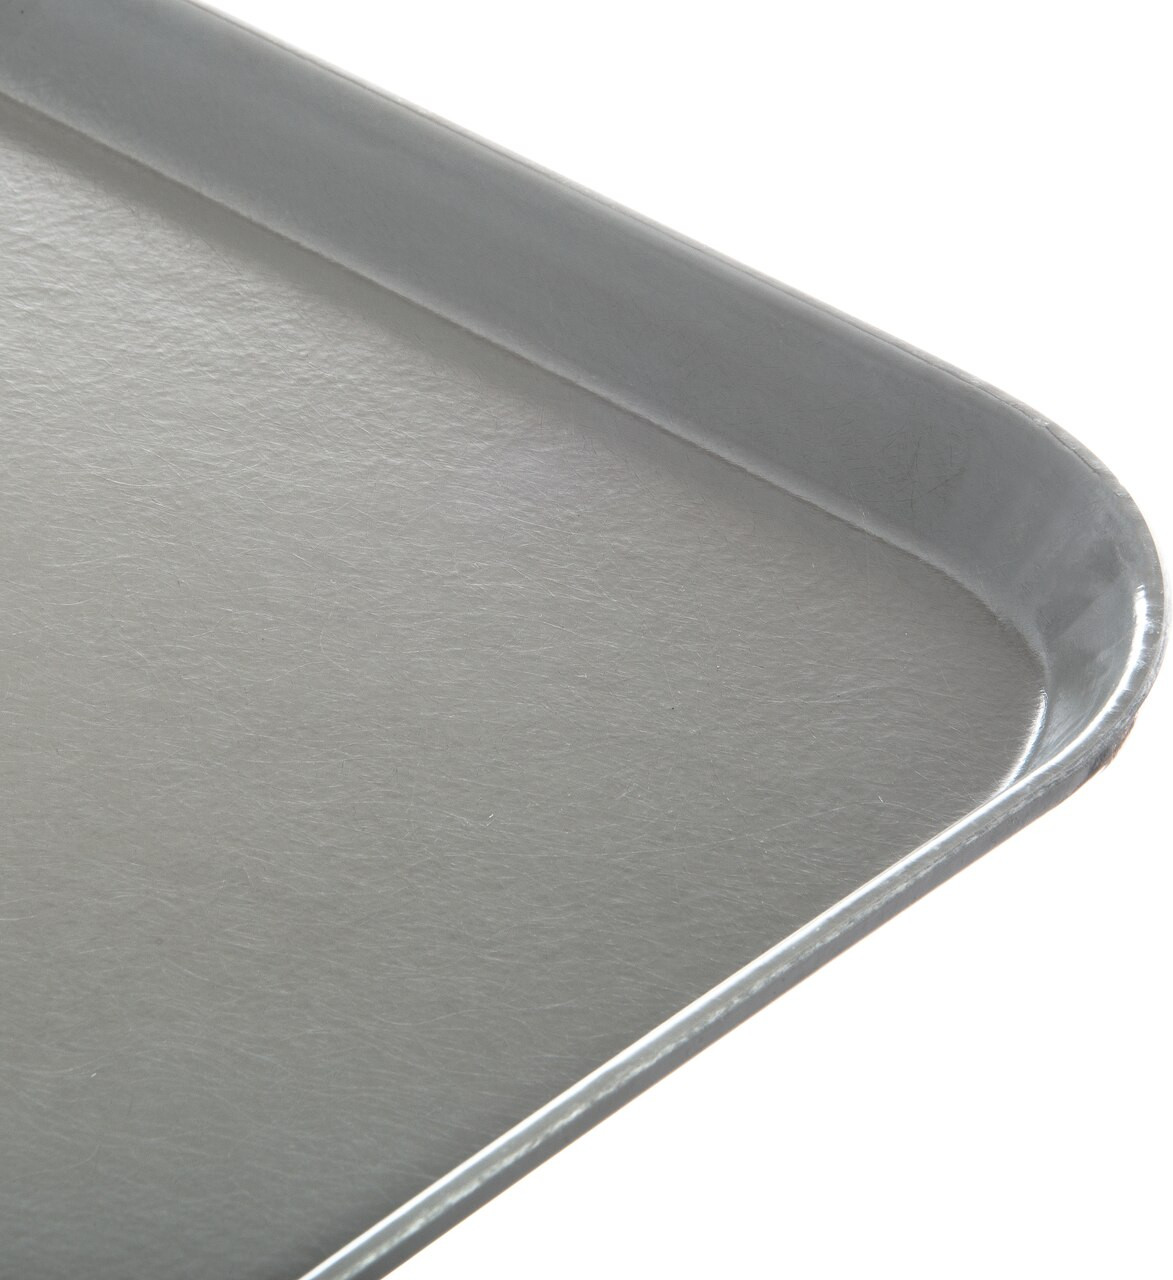 "Tray, 15"" x 20"", size M, flat, fiberglass, gray (12 each per case)"